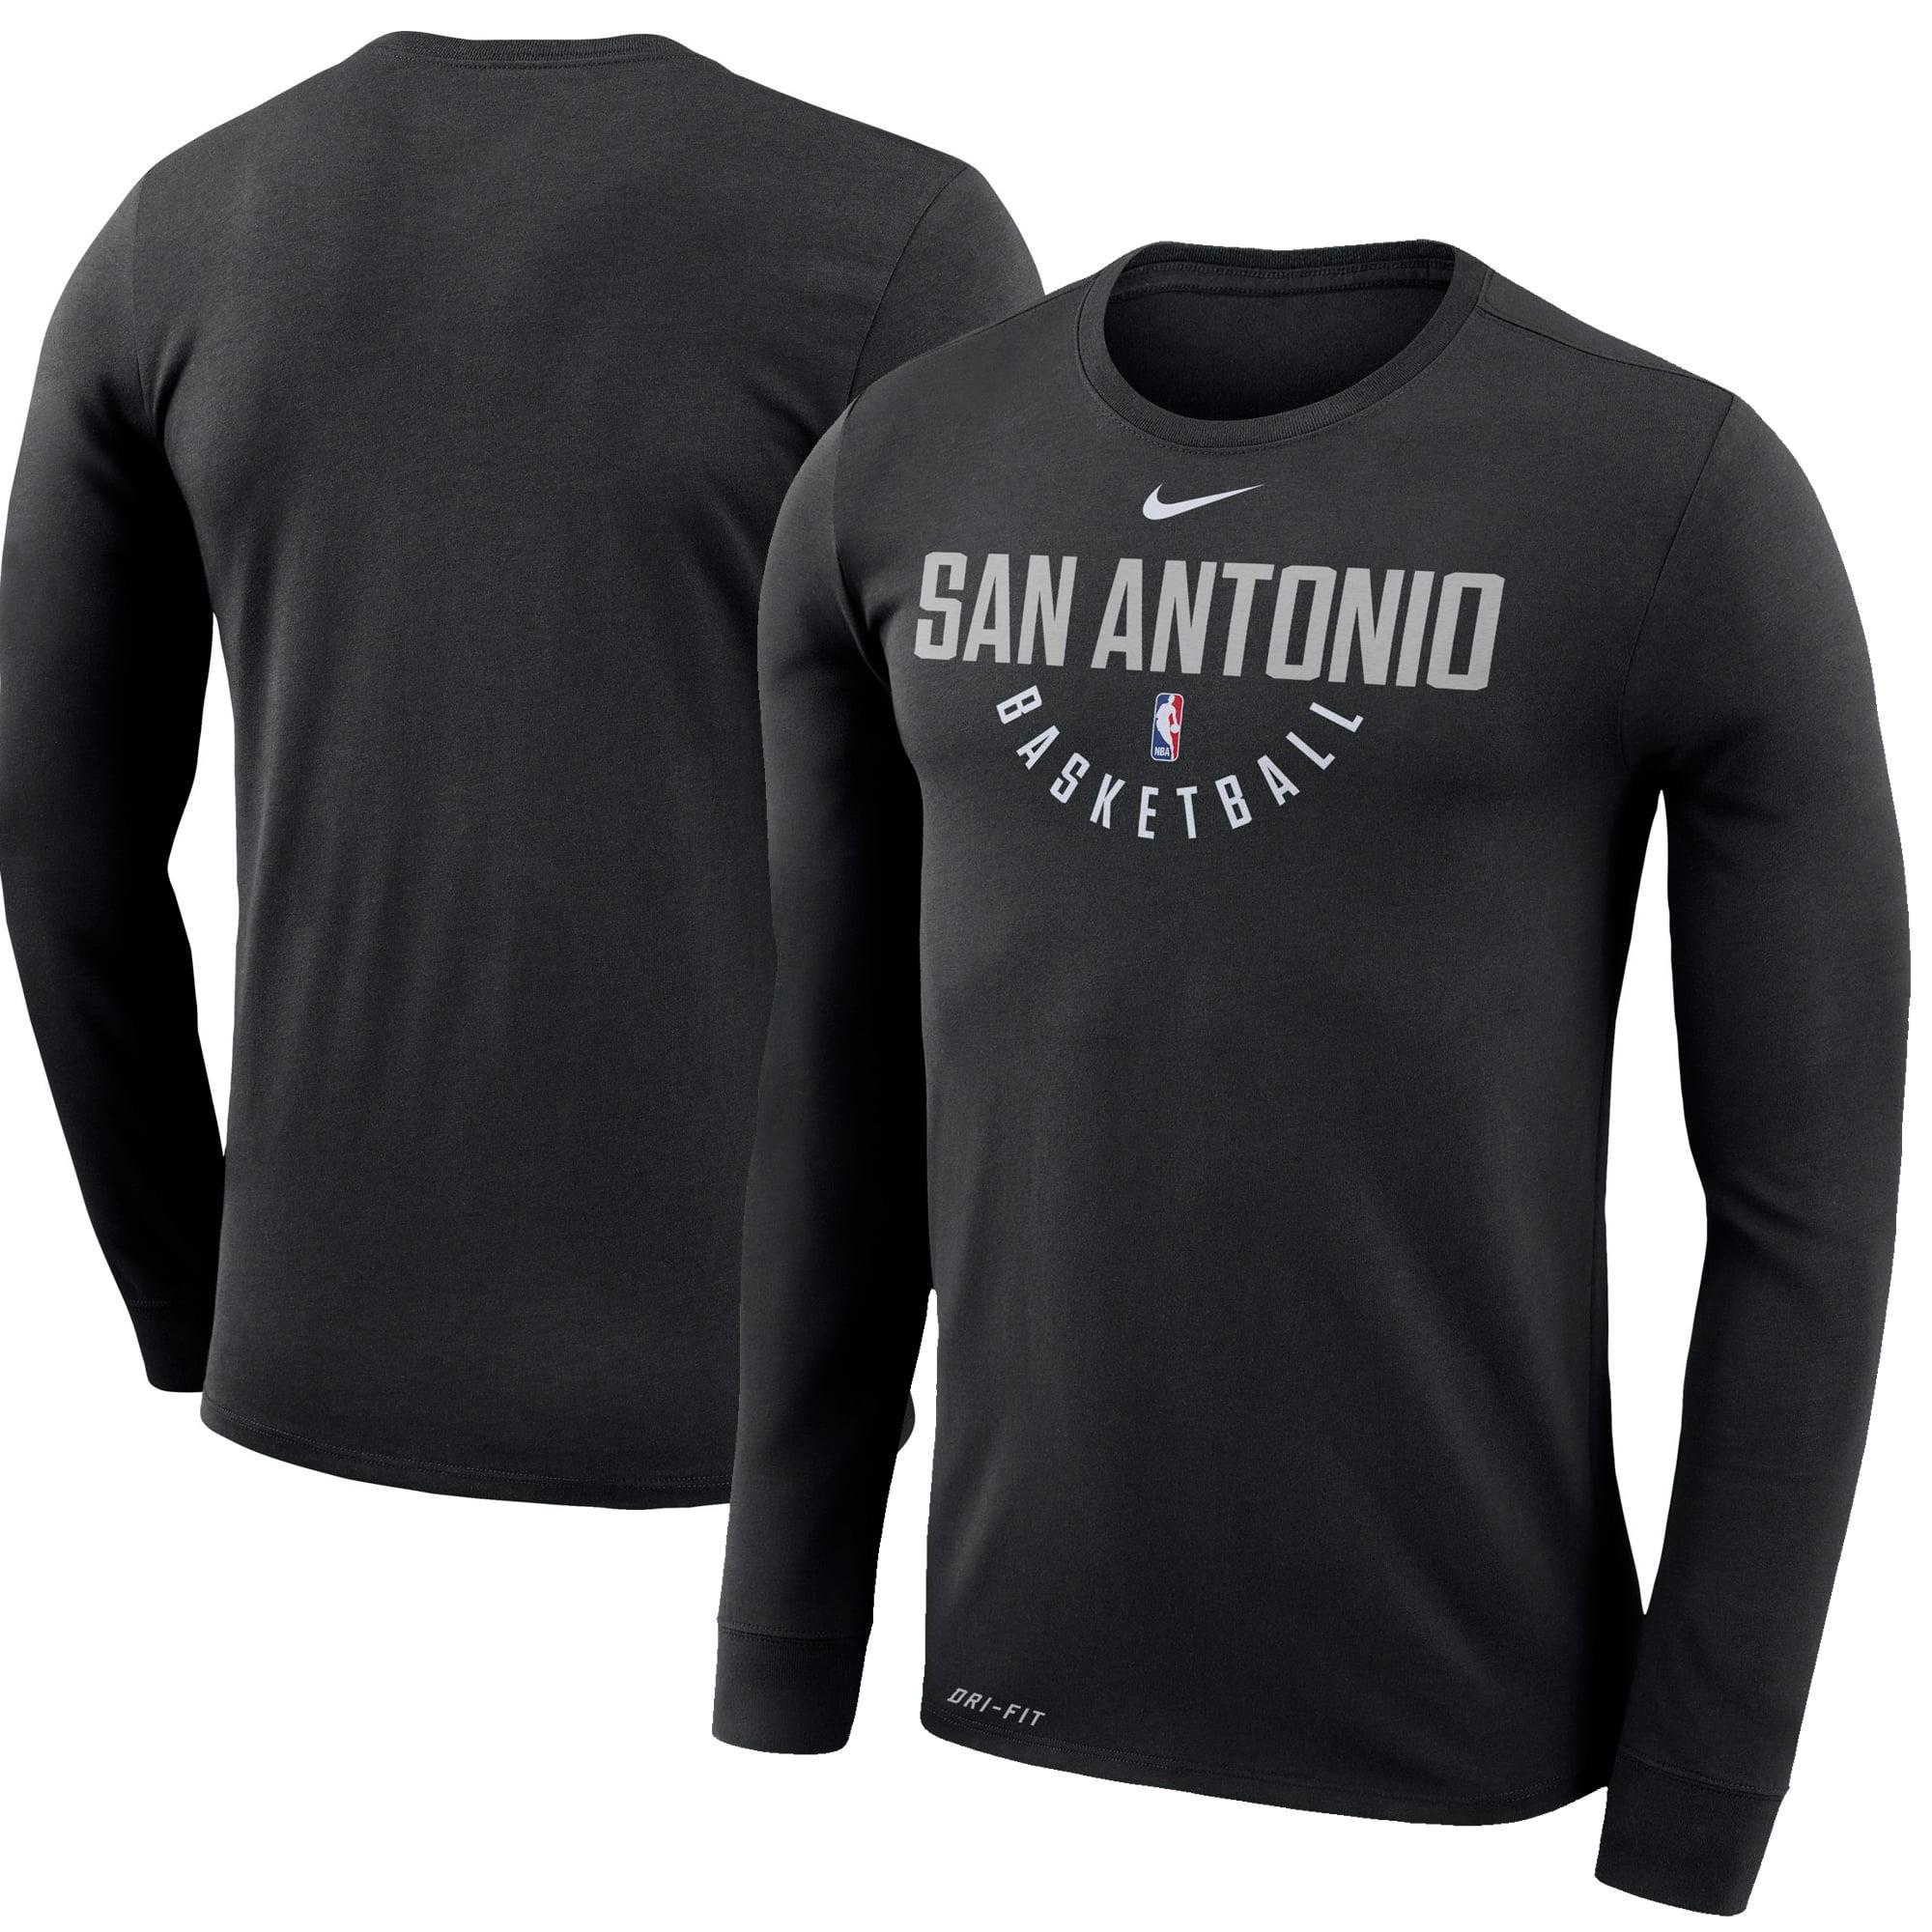 San Antonio Spurs Nike Practice Long Sleeve Performance T-Shirt - Black